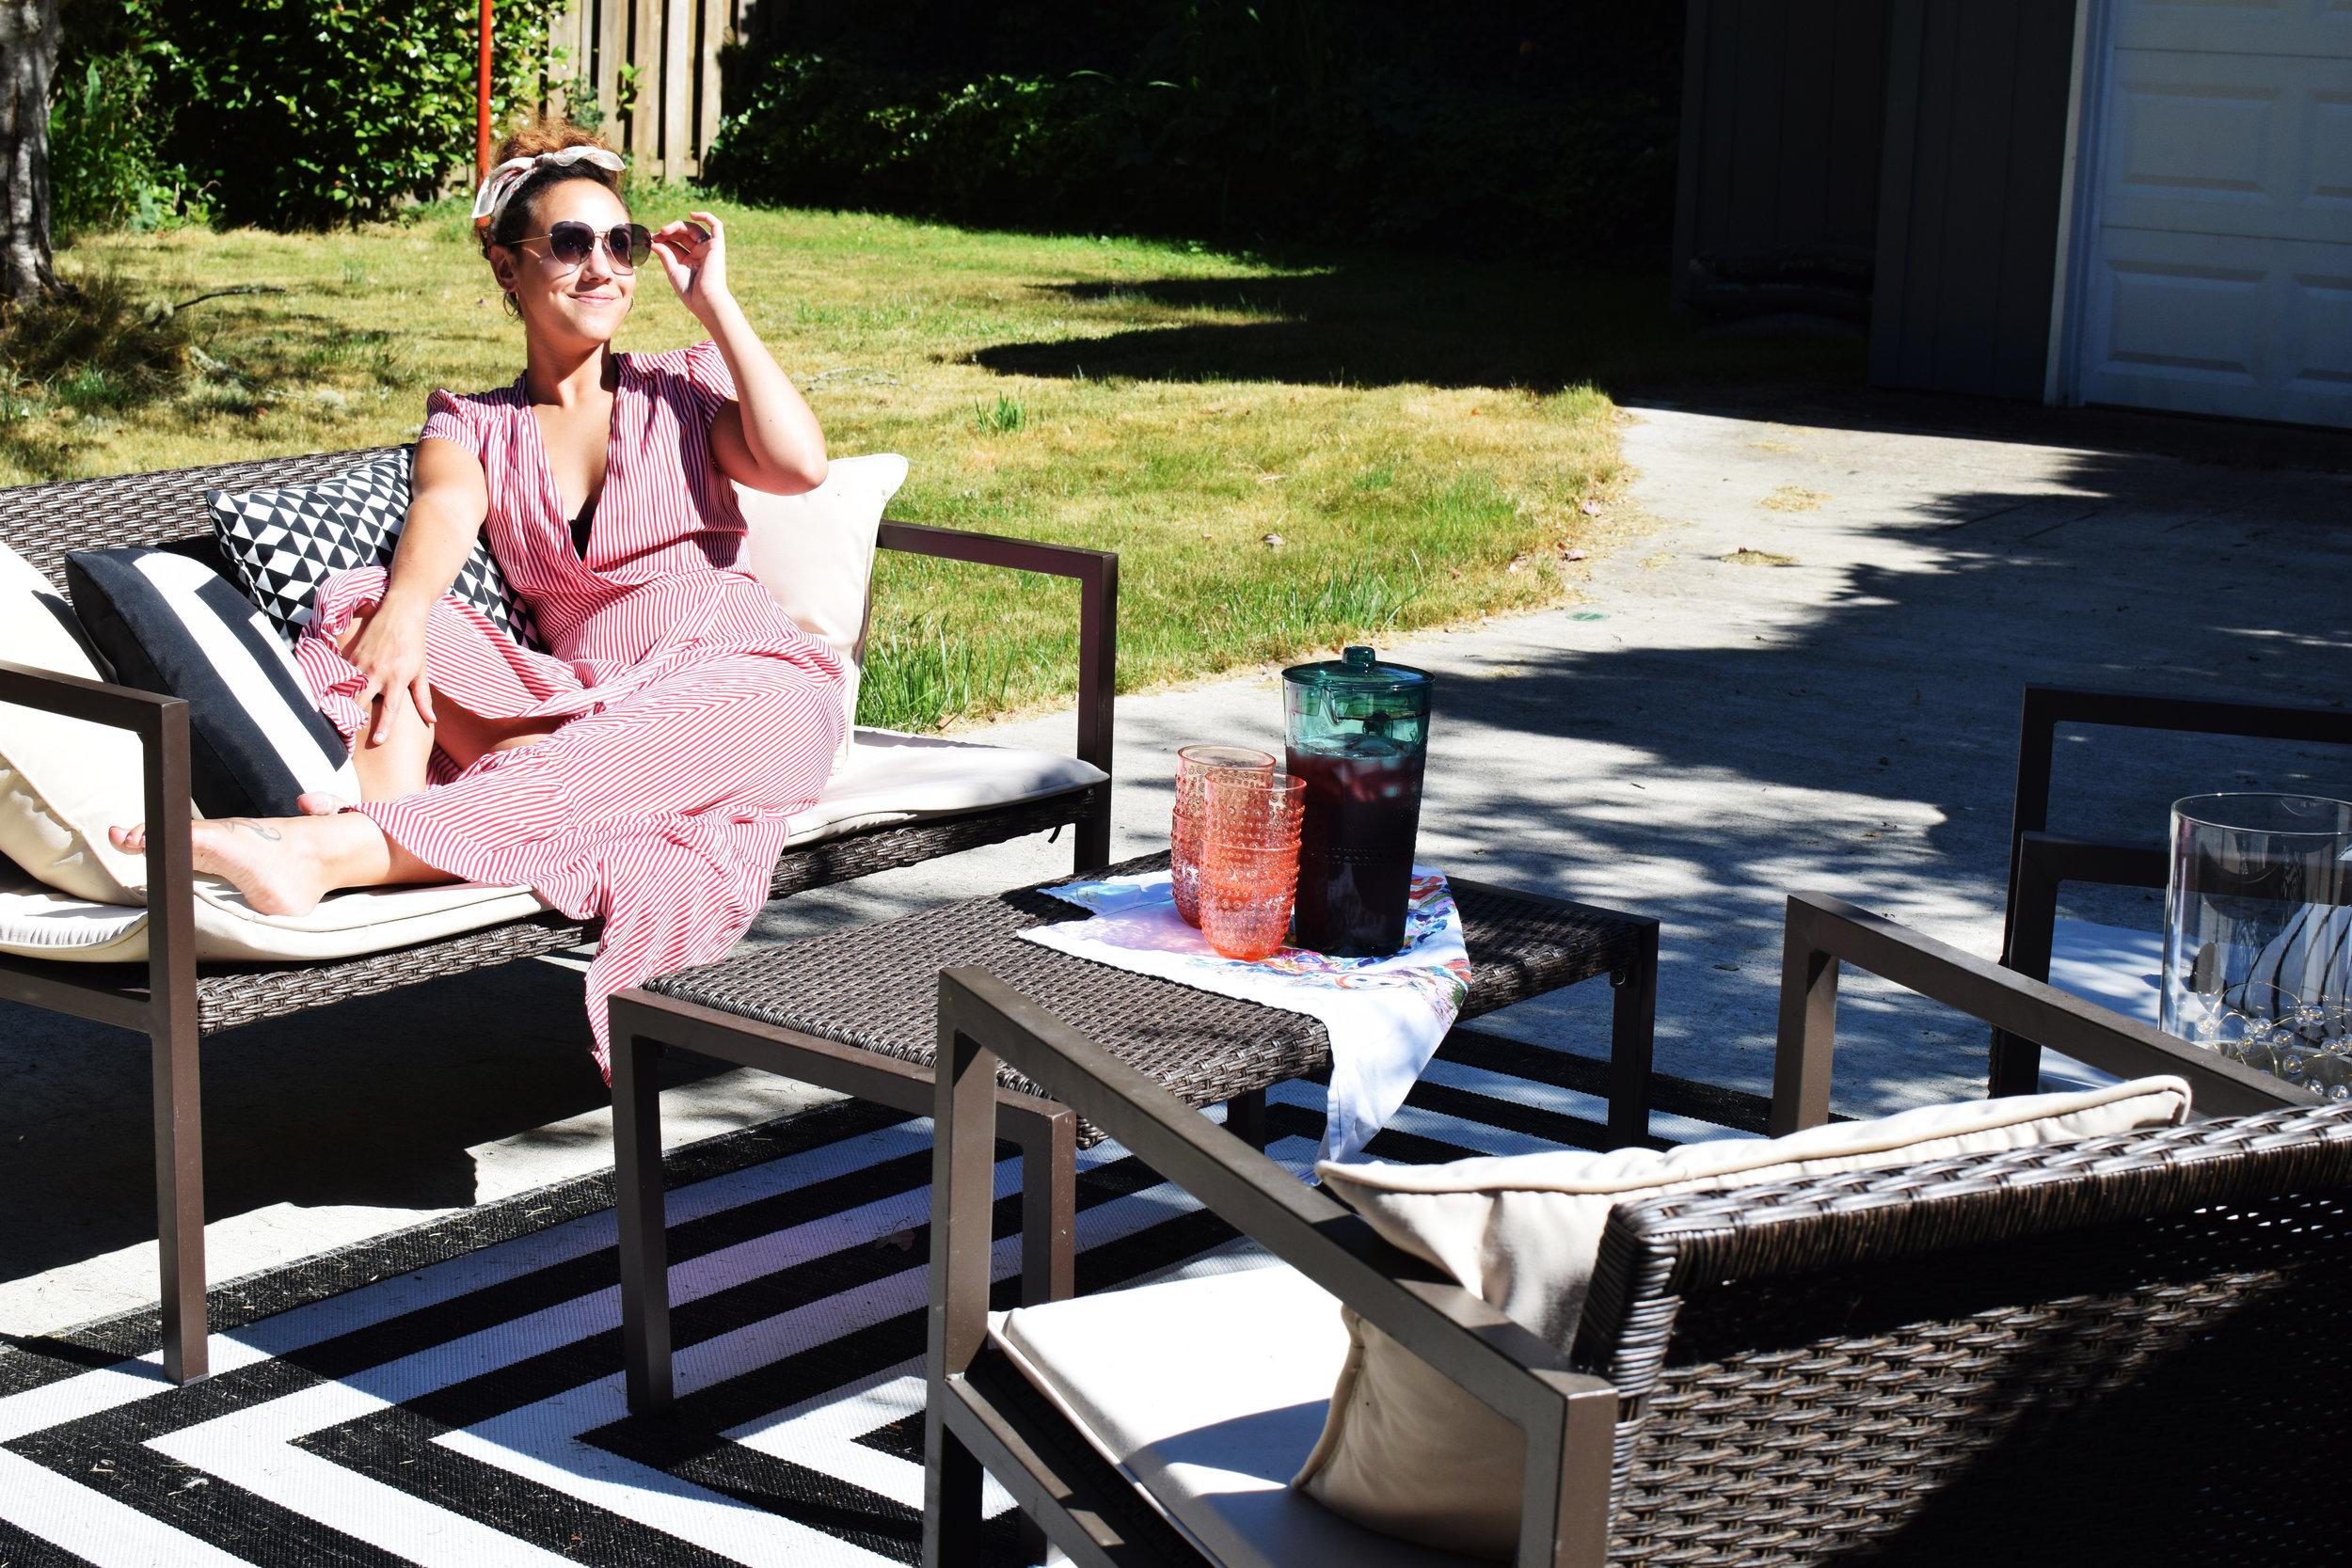 backyard outfit 1.jpg